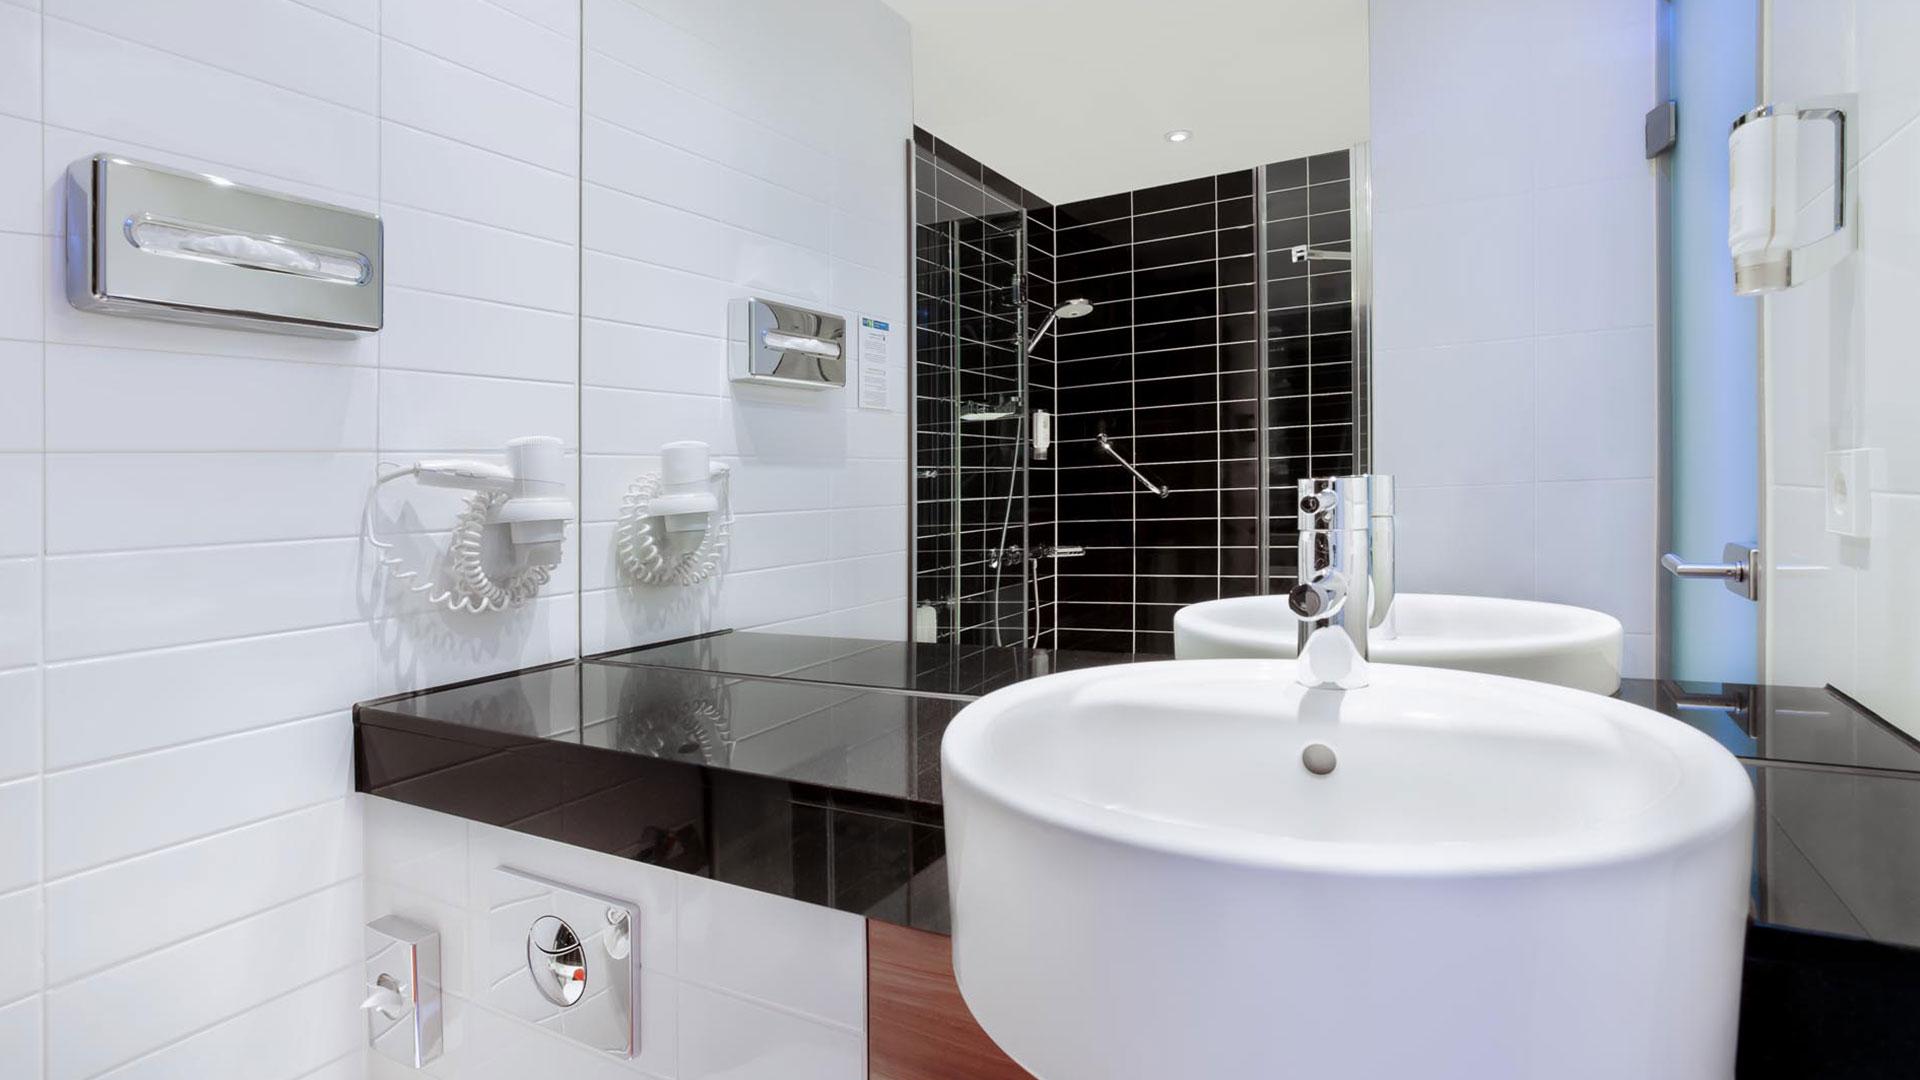 Photo of a bathroom - Holiday Inn Express Augsburg